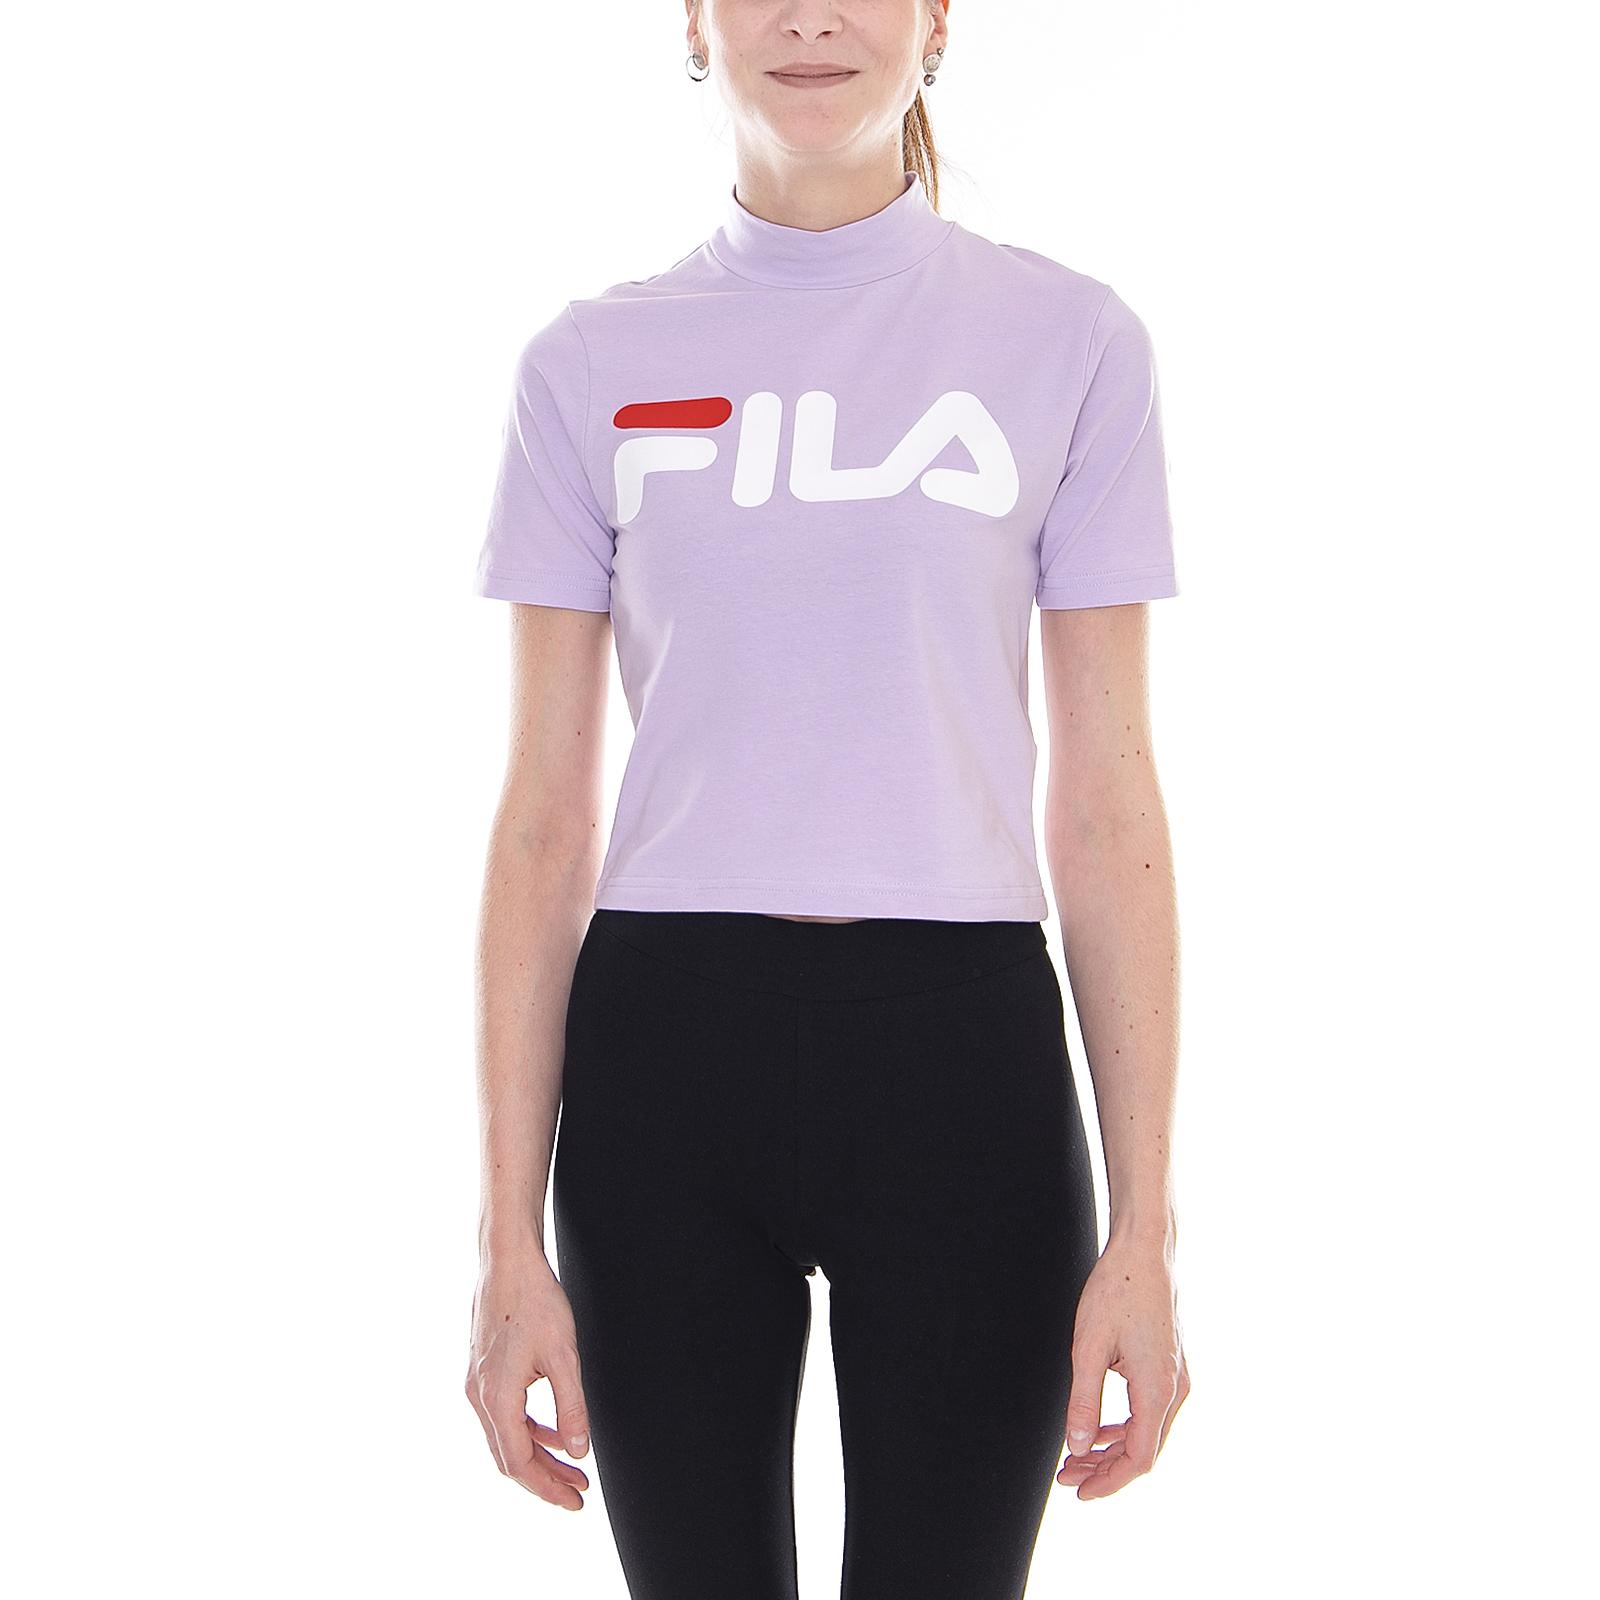 T Fila Violet shirt Pétale Orchidée Turtle Every Femmes Tee 6aqwOad